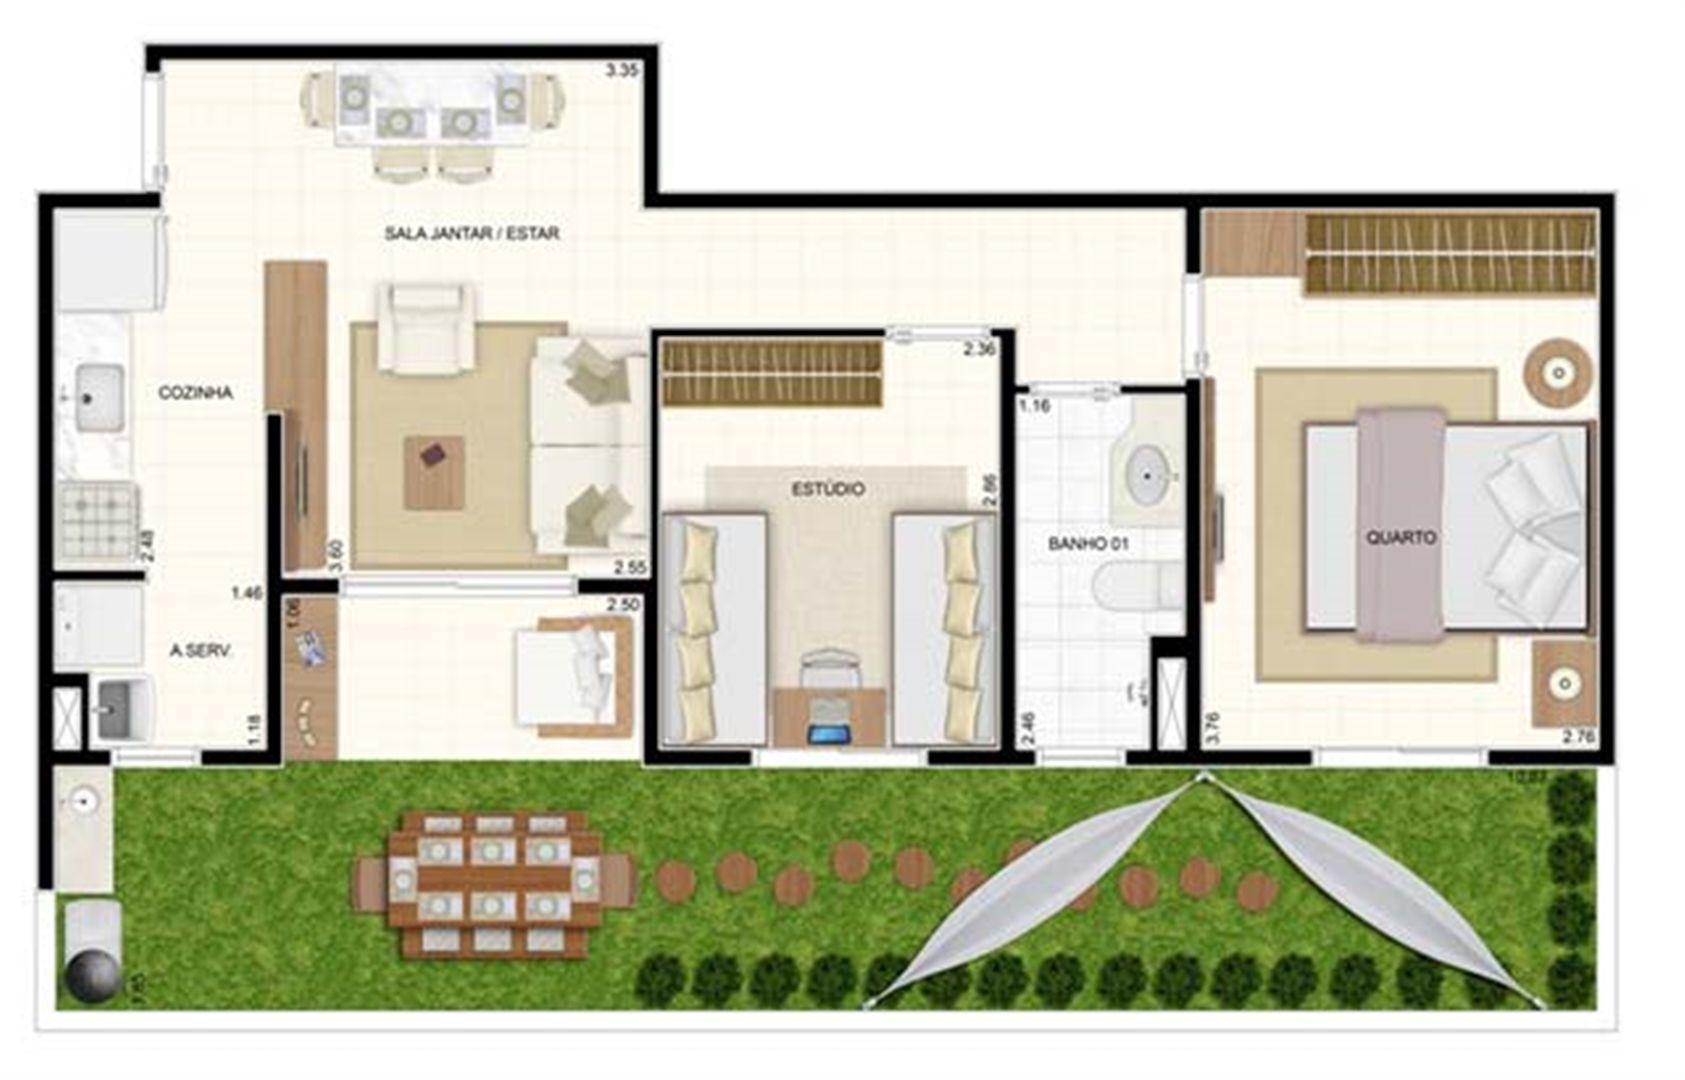 Giardino 2 dorms 70m² | Vita 2 Residencial Clube – Apartamento no  Pitimbu - Natal - Rio Grande do Norte